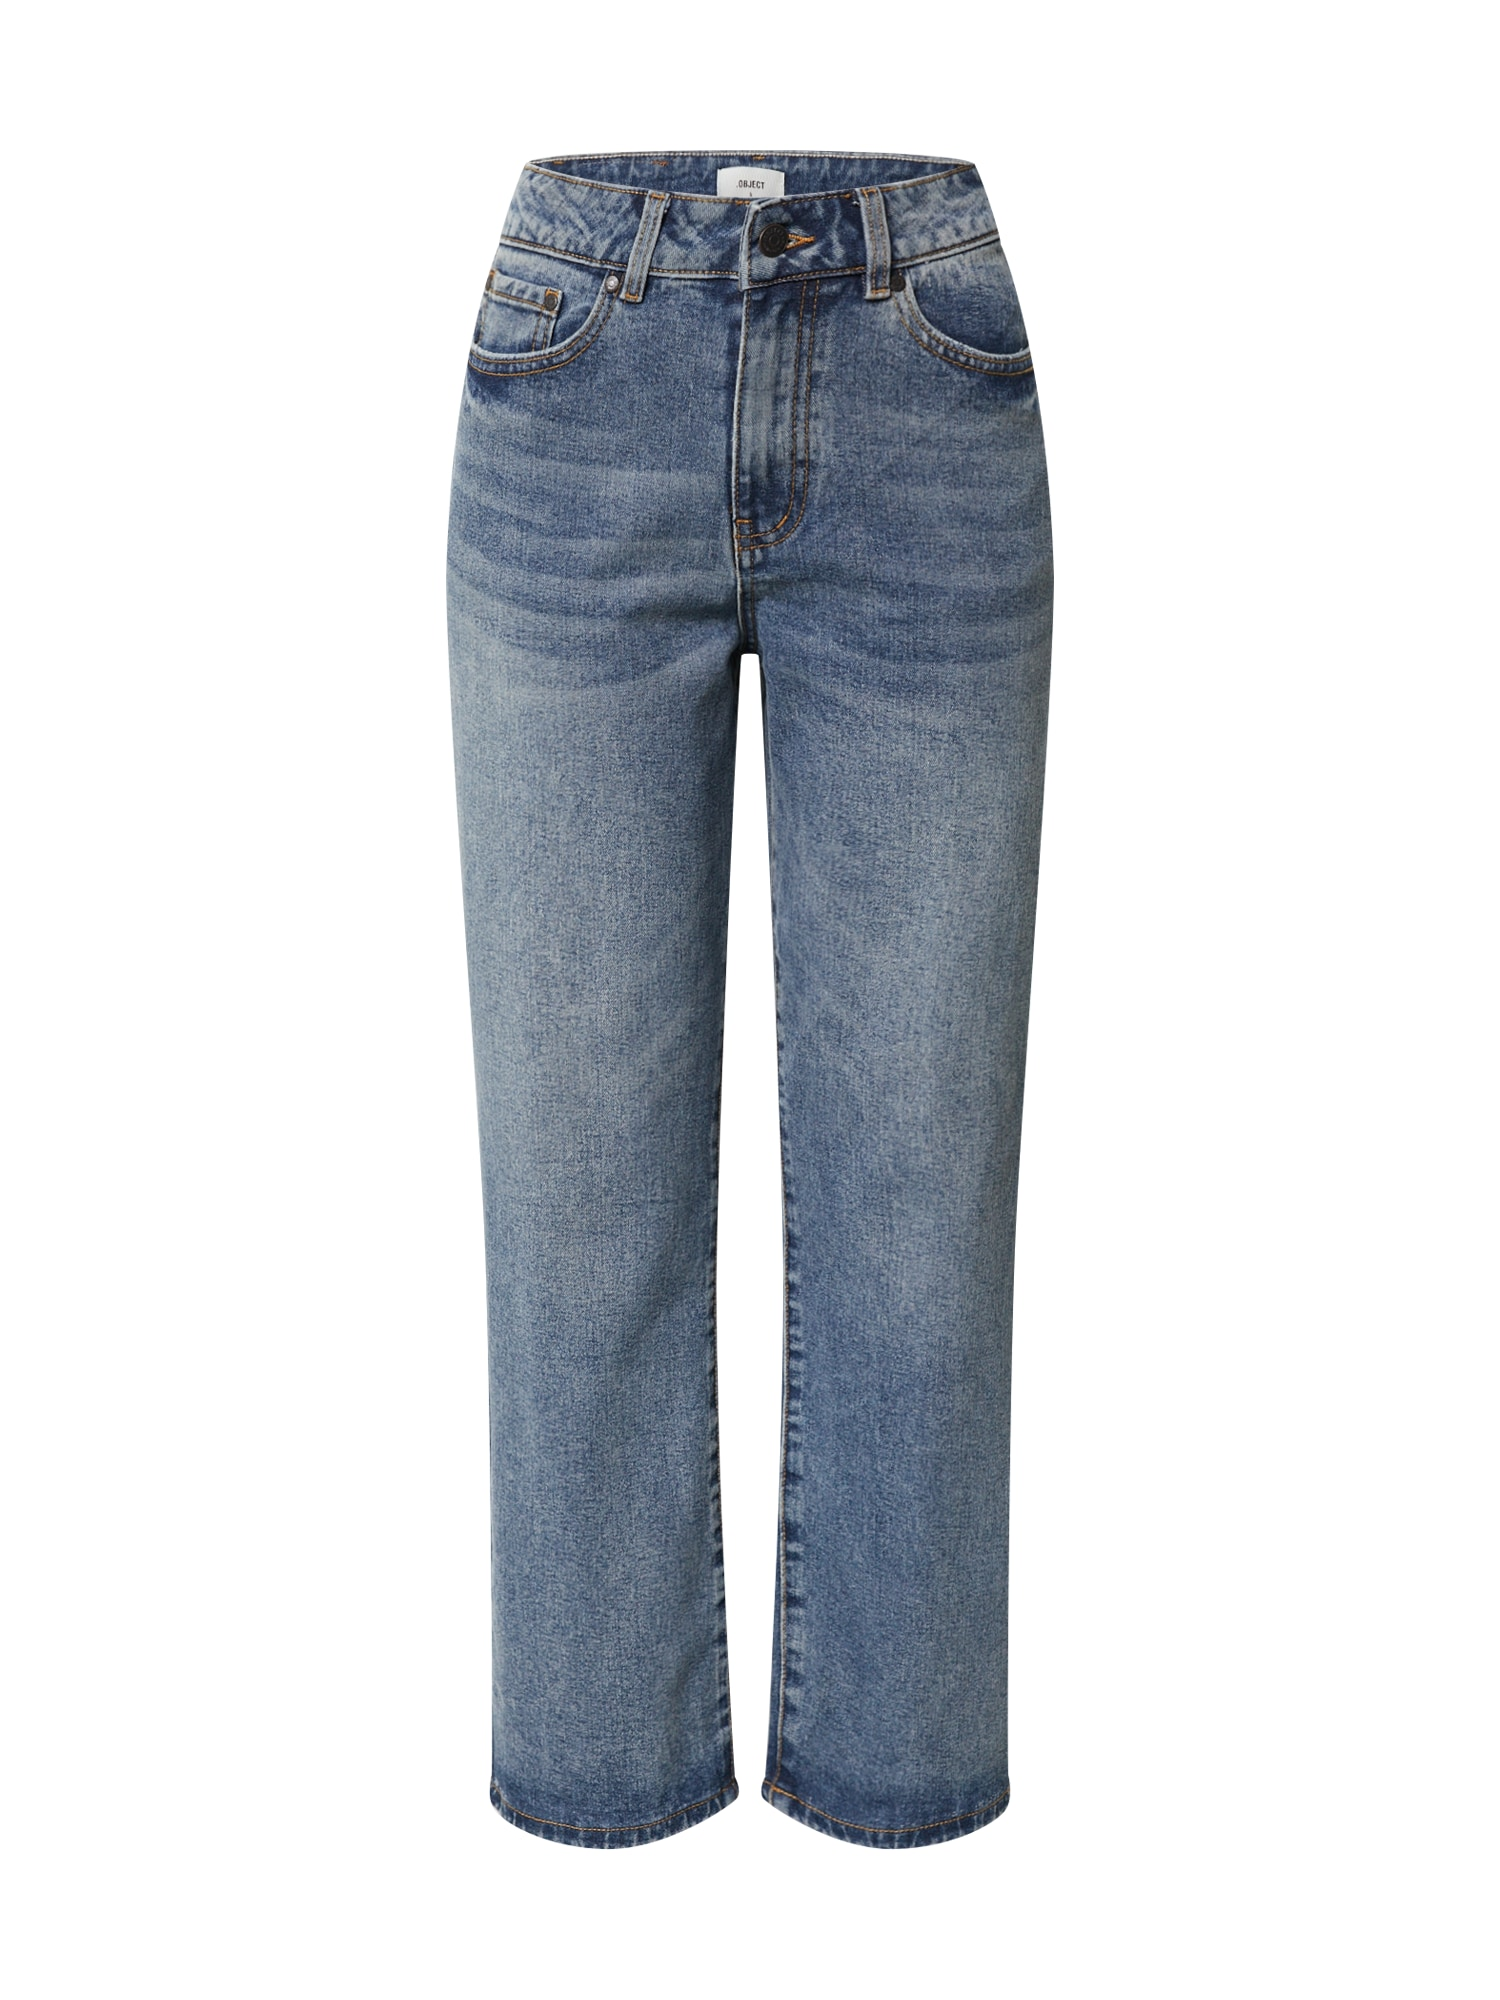 OBJECT Džinsai tamsiai (džinso) mėlyna